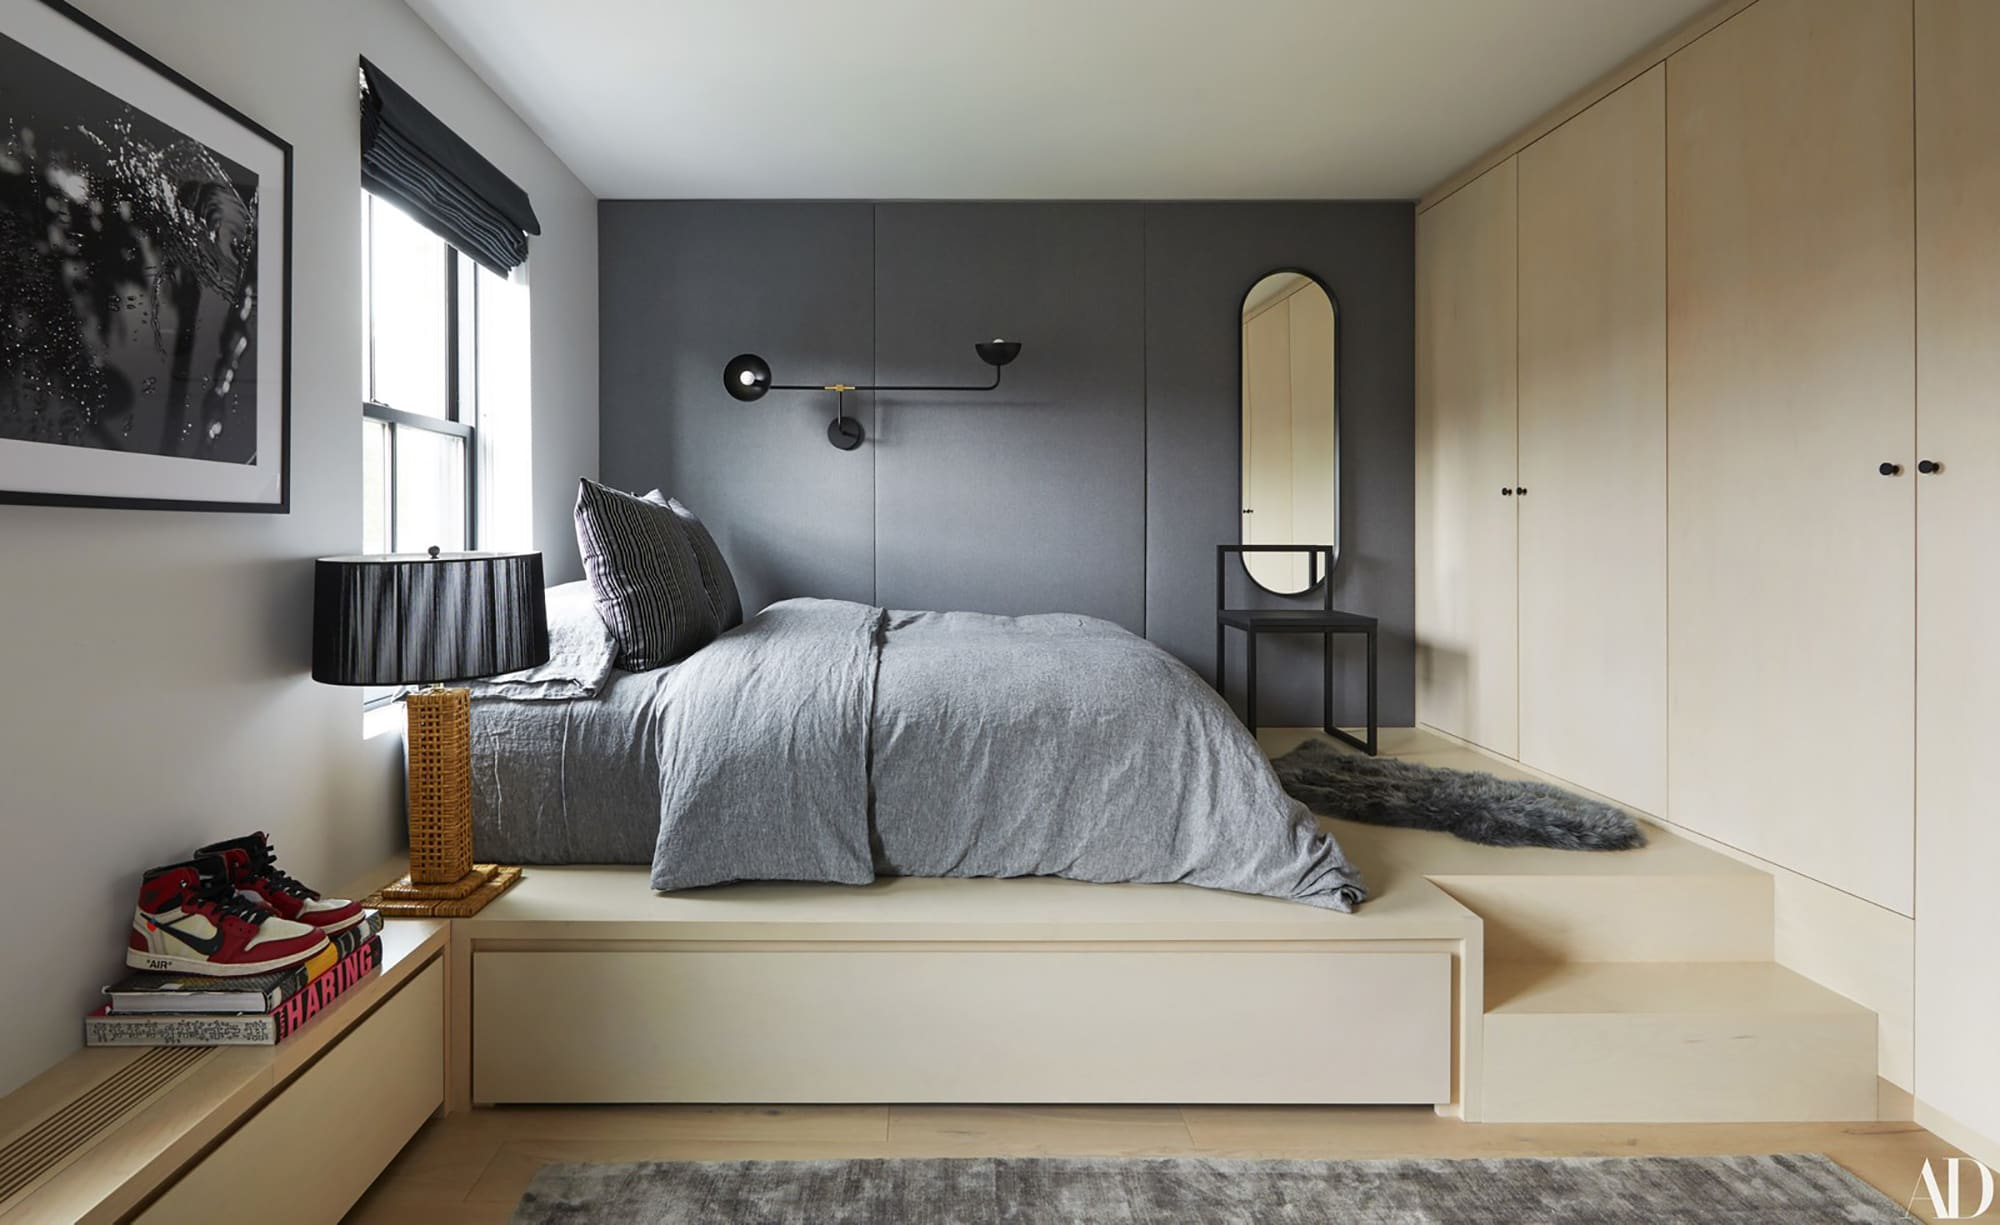 Deco Chambre Ado Garcon Design idée déco] une chambre d'ado conviviale | cocon - déco & vie